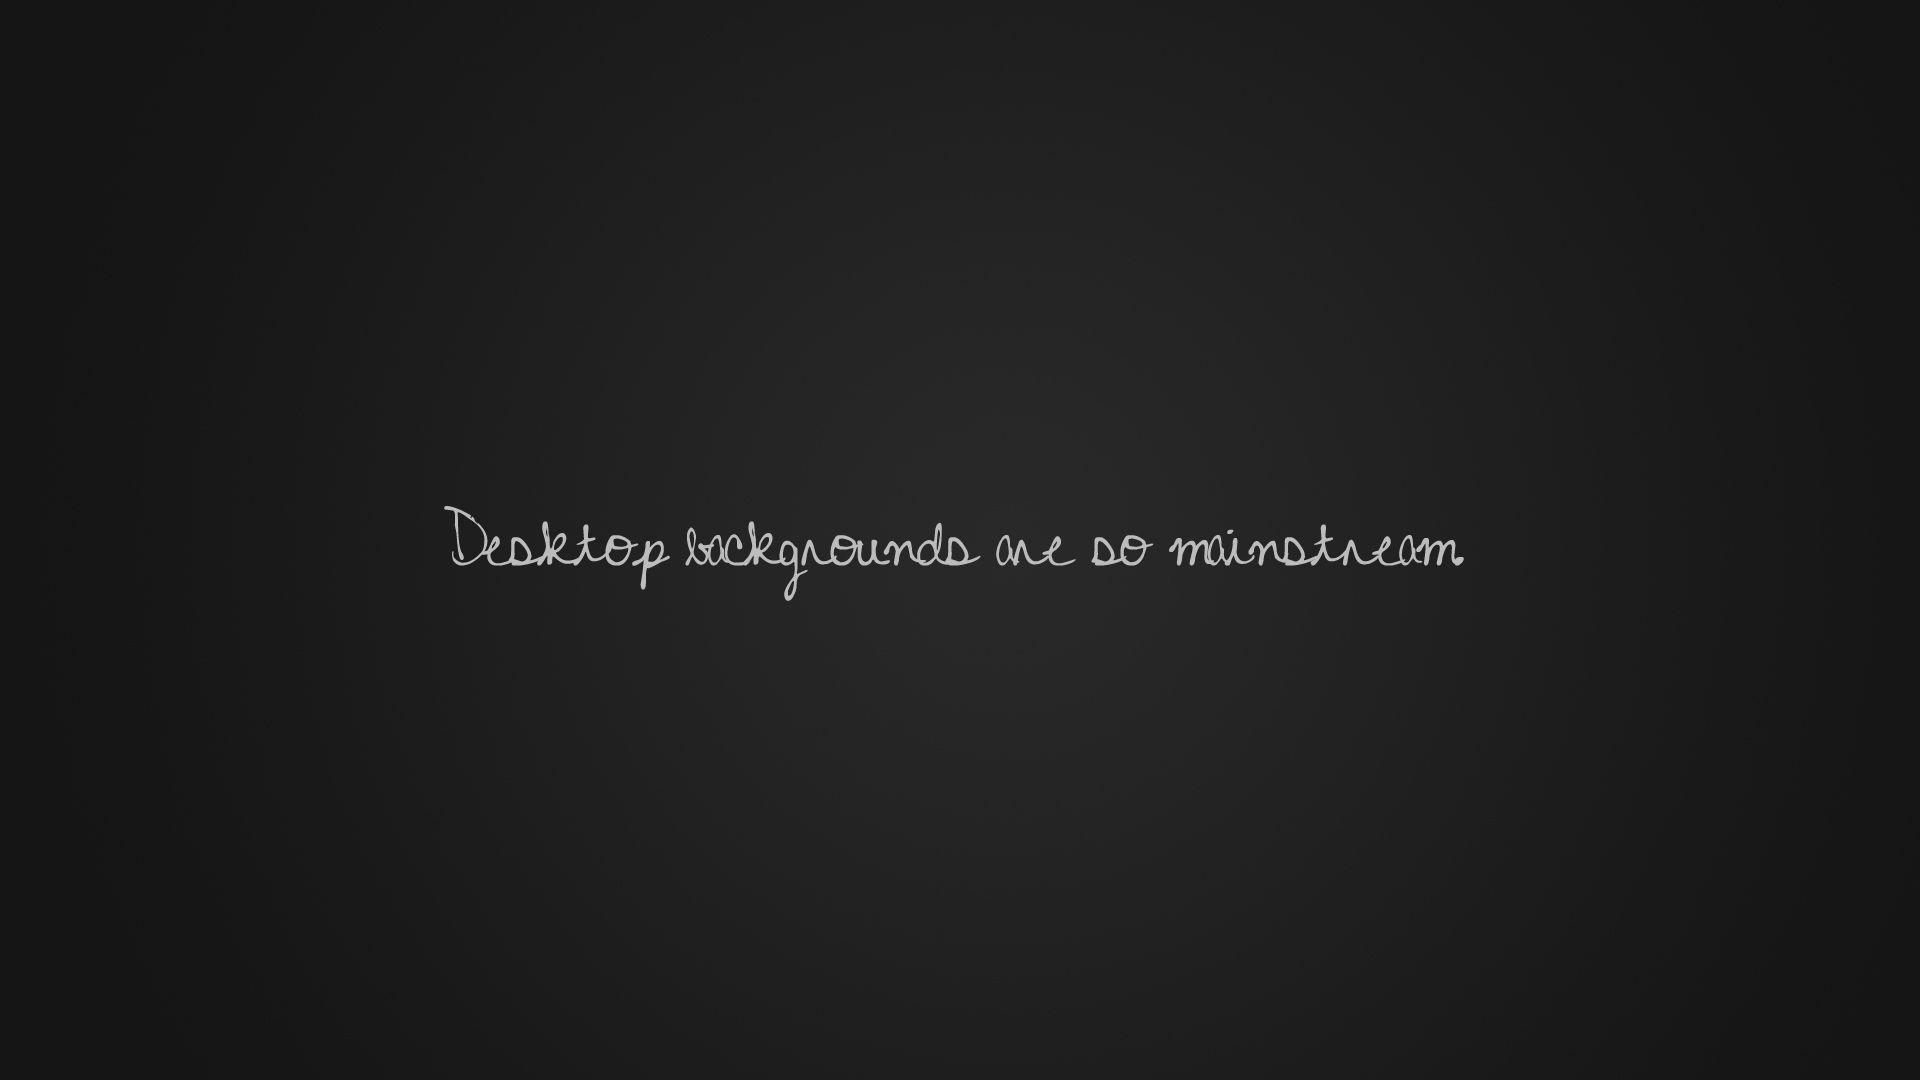 Tumblr Wallpaper For Desktop Hipster Computer Backgrounds – Wallpaper …